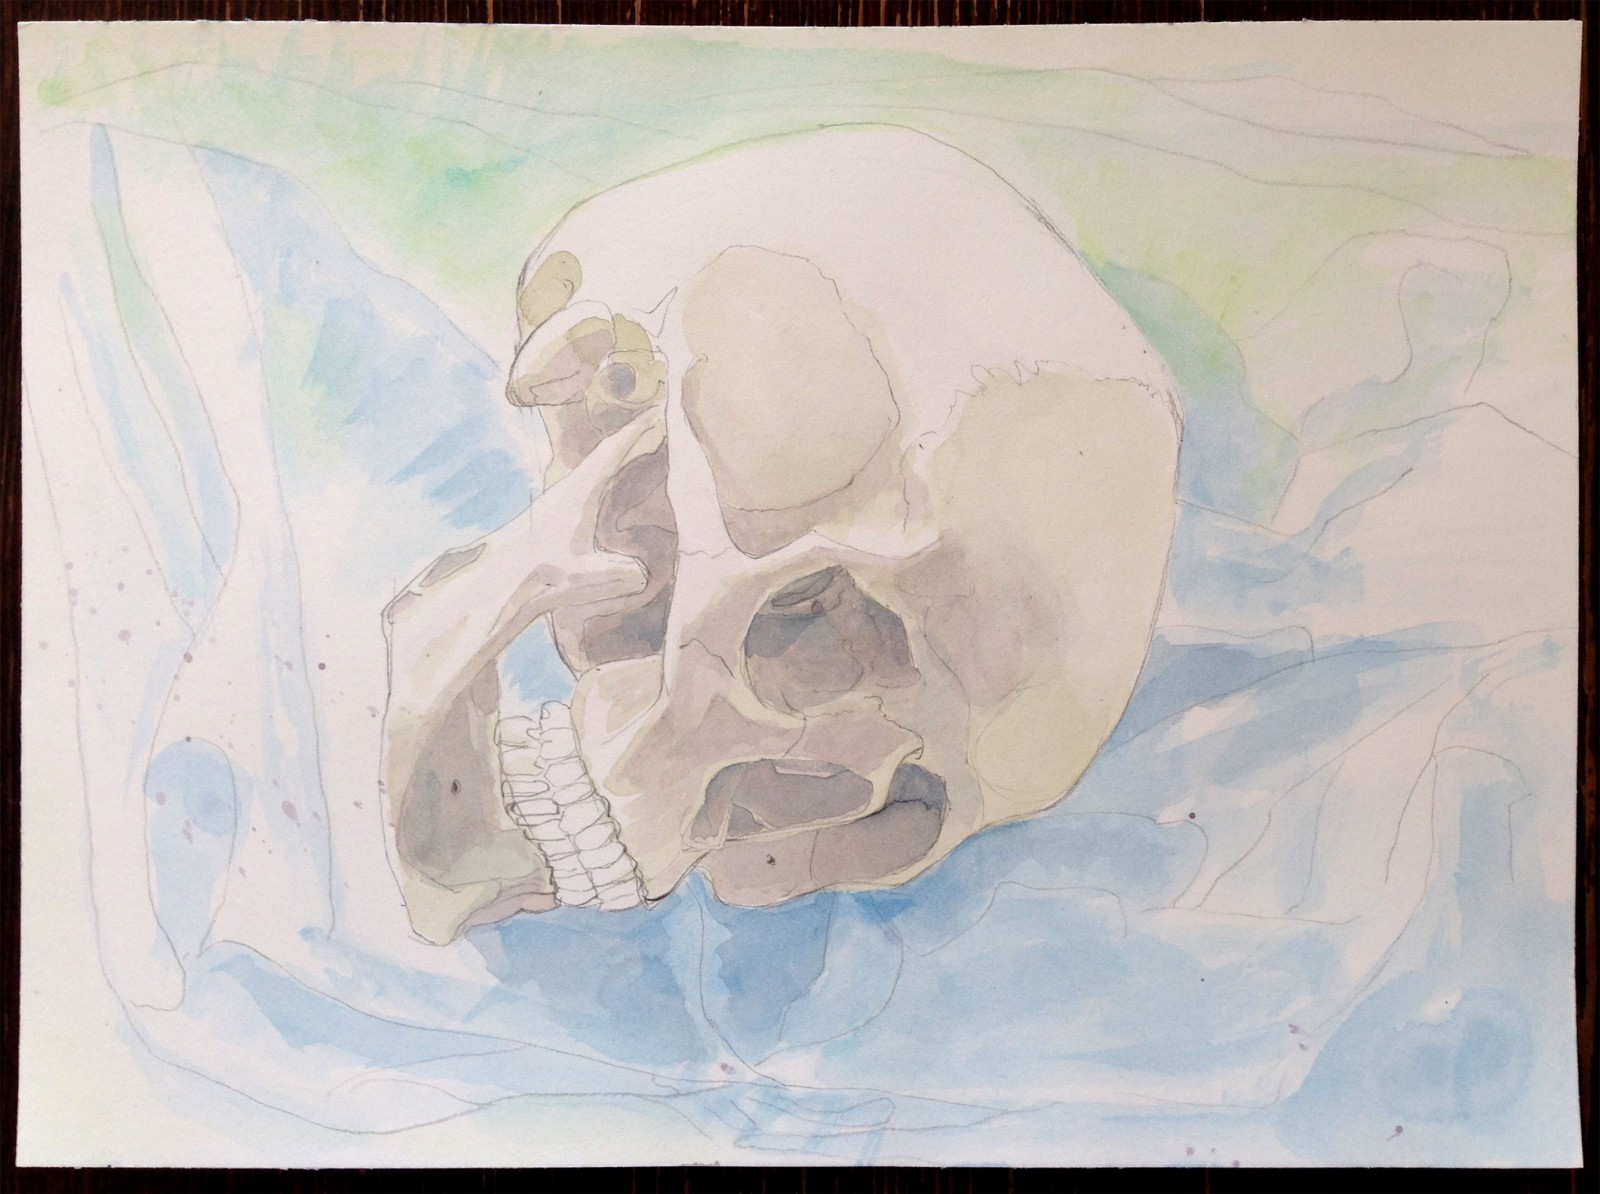 Kim Nekarda: untitled, 2018, watercolour on paper, 26 x 36 cm